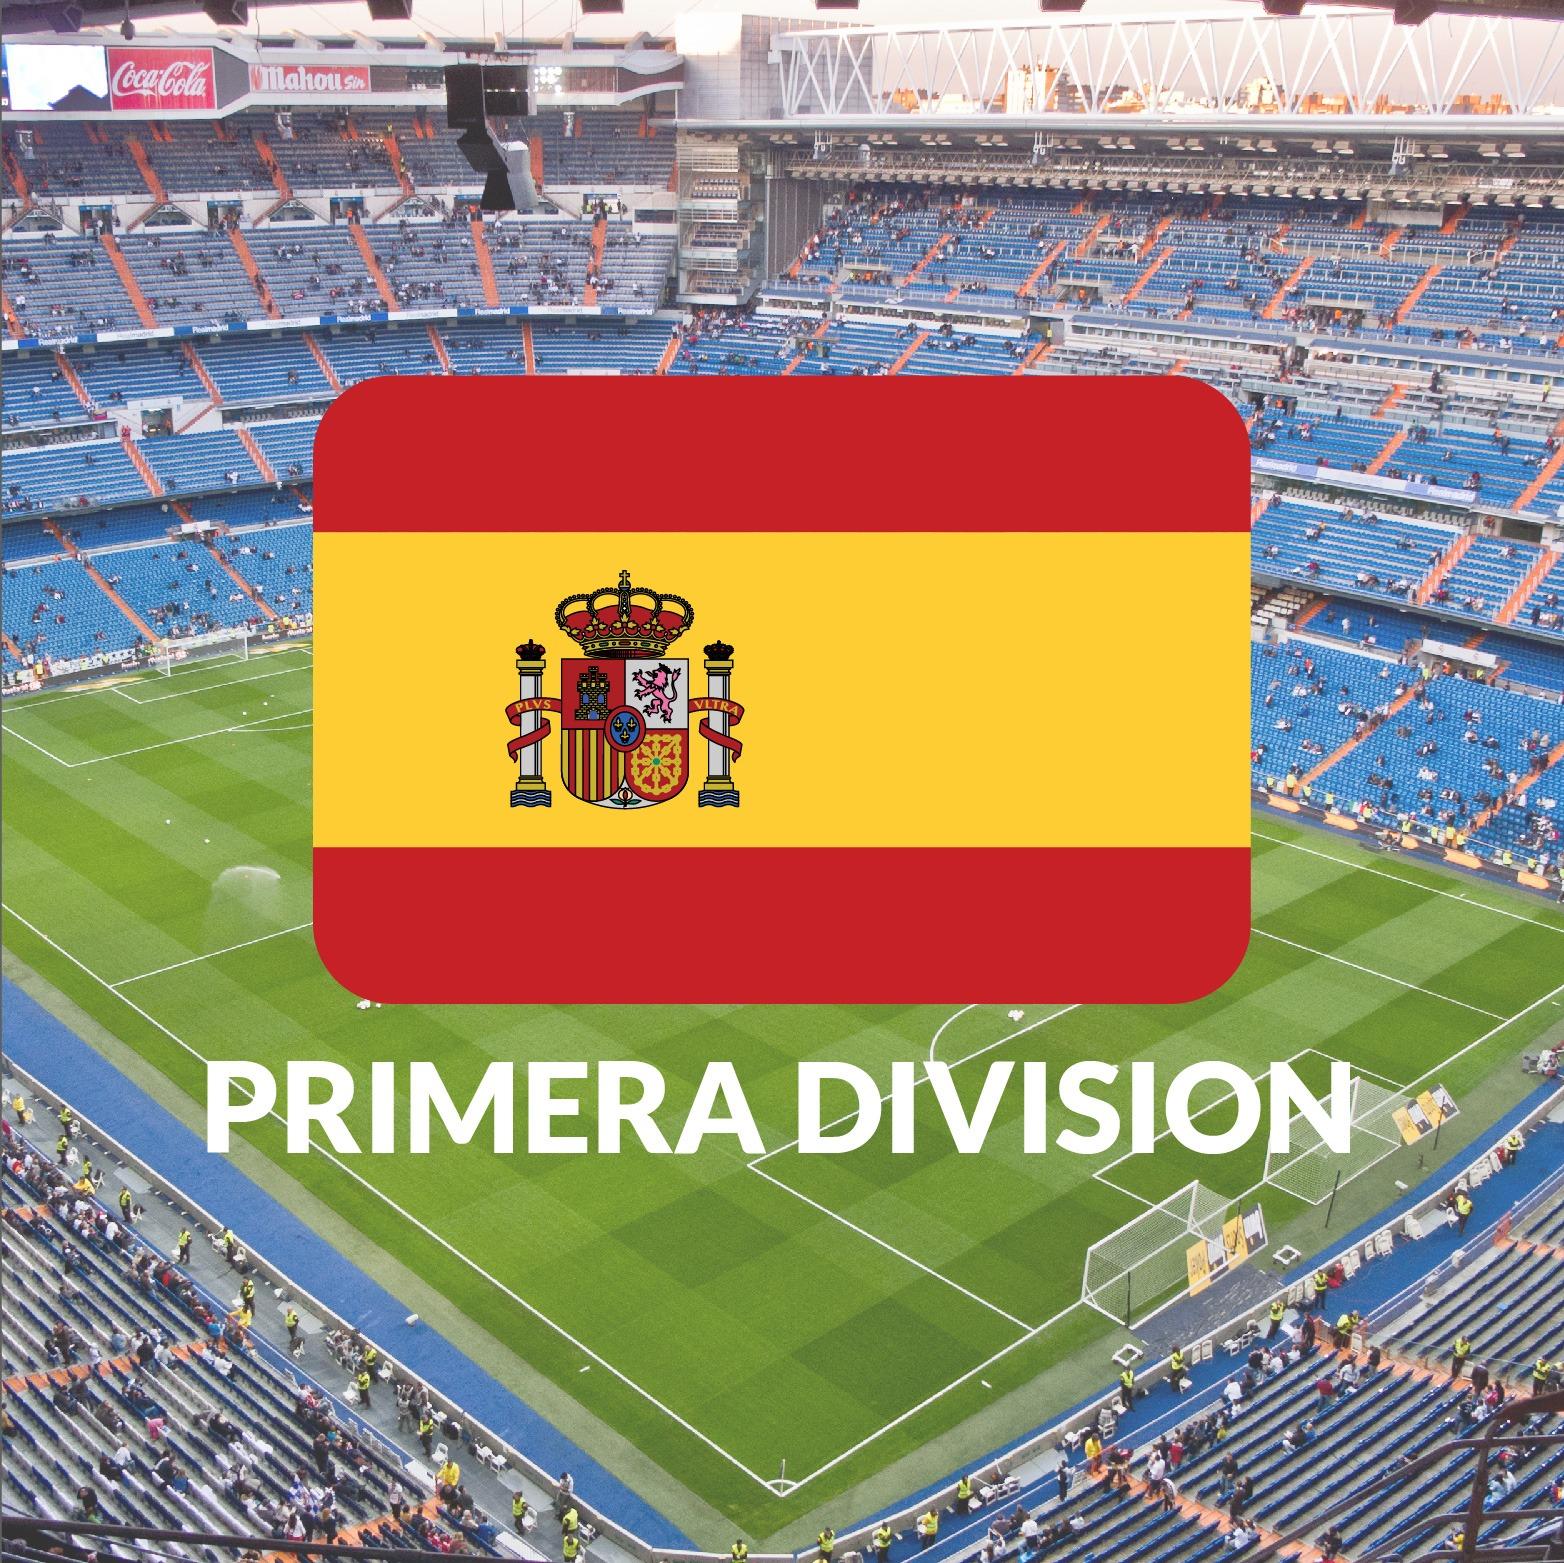 Primeradivision Thumb 1 01